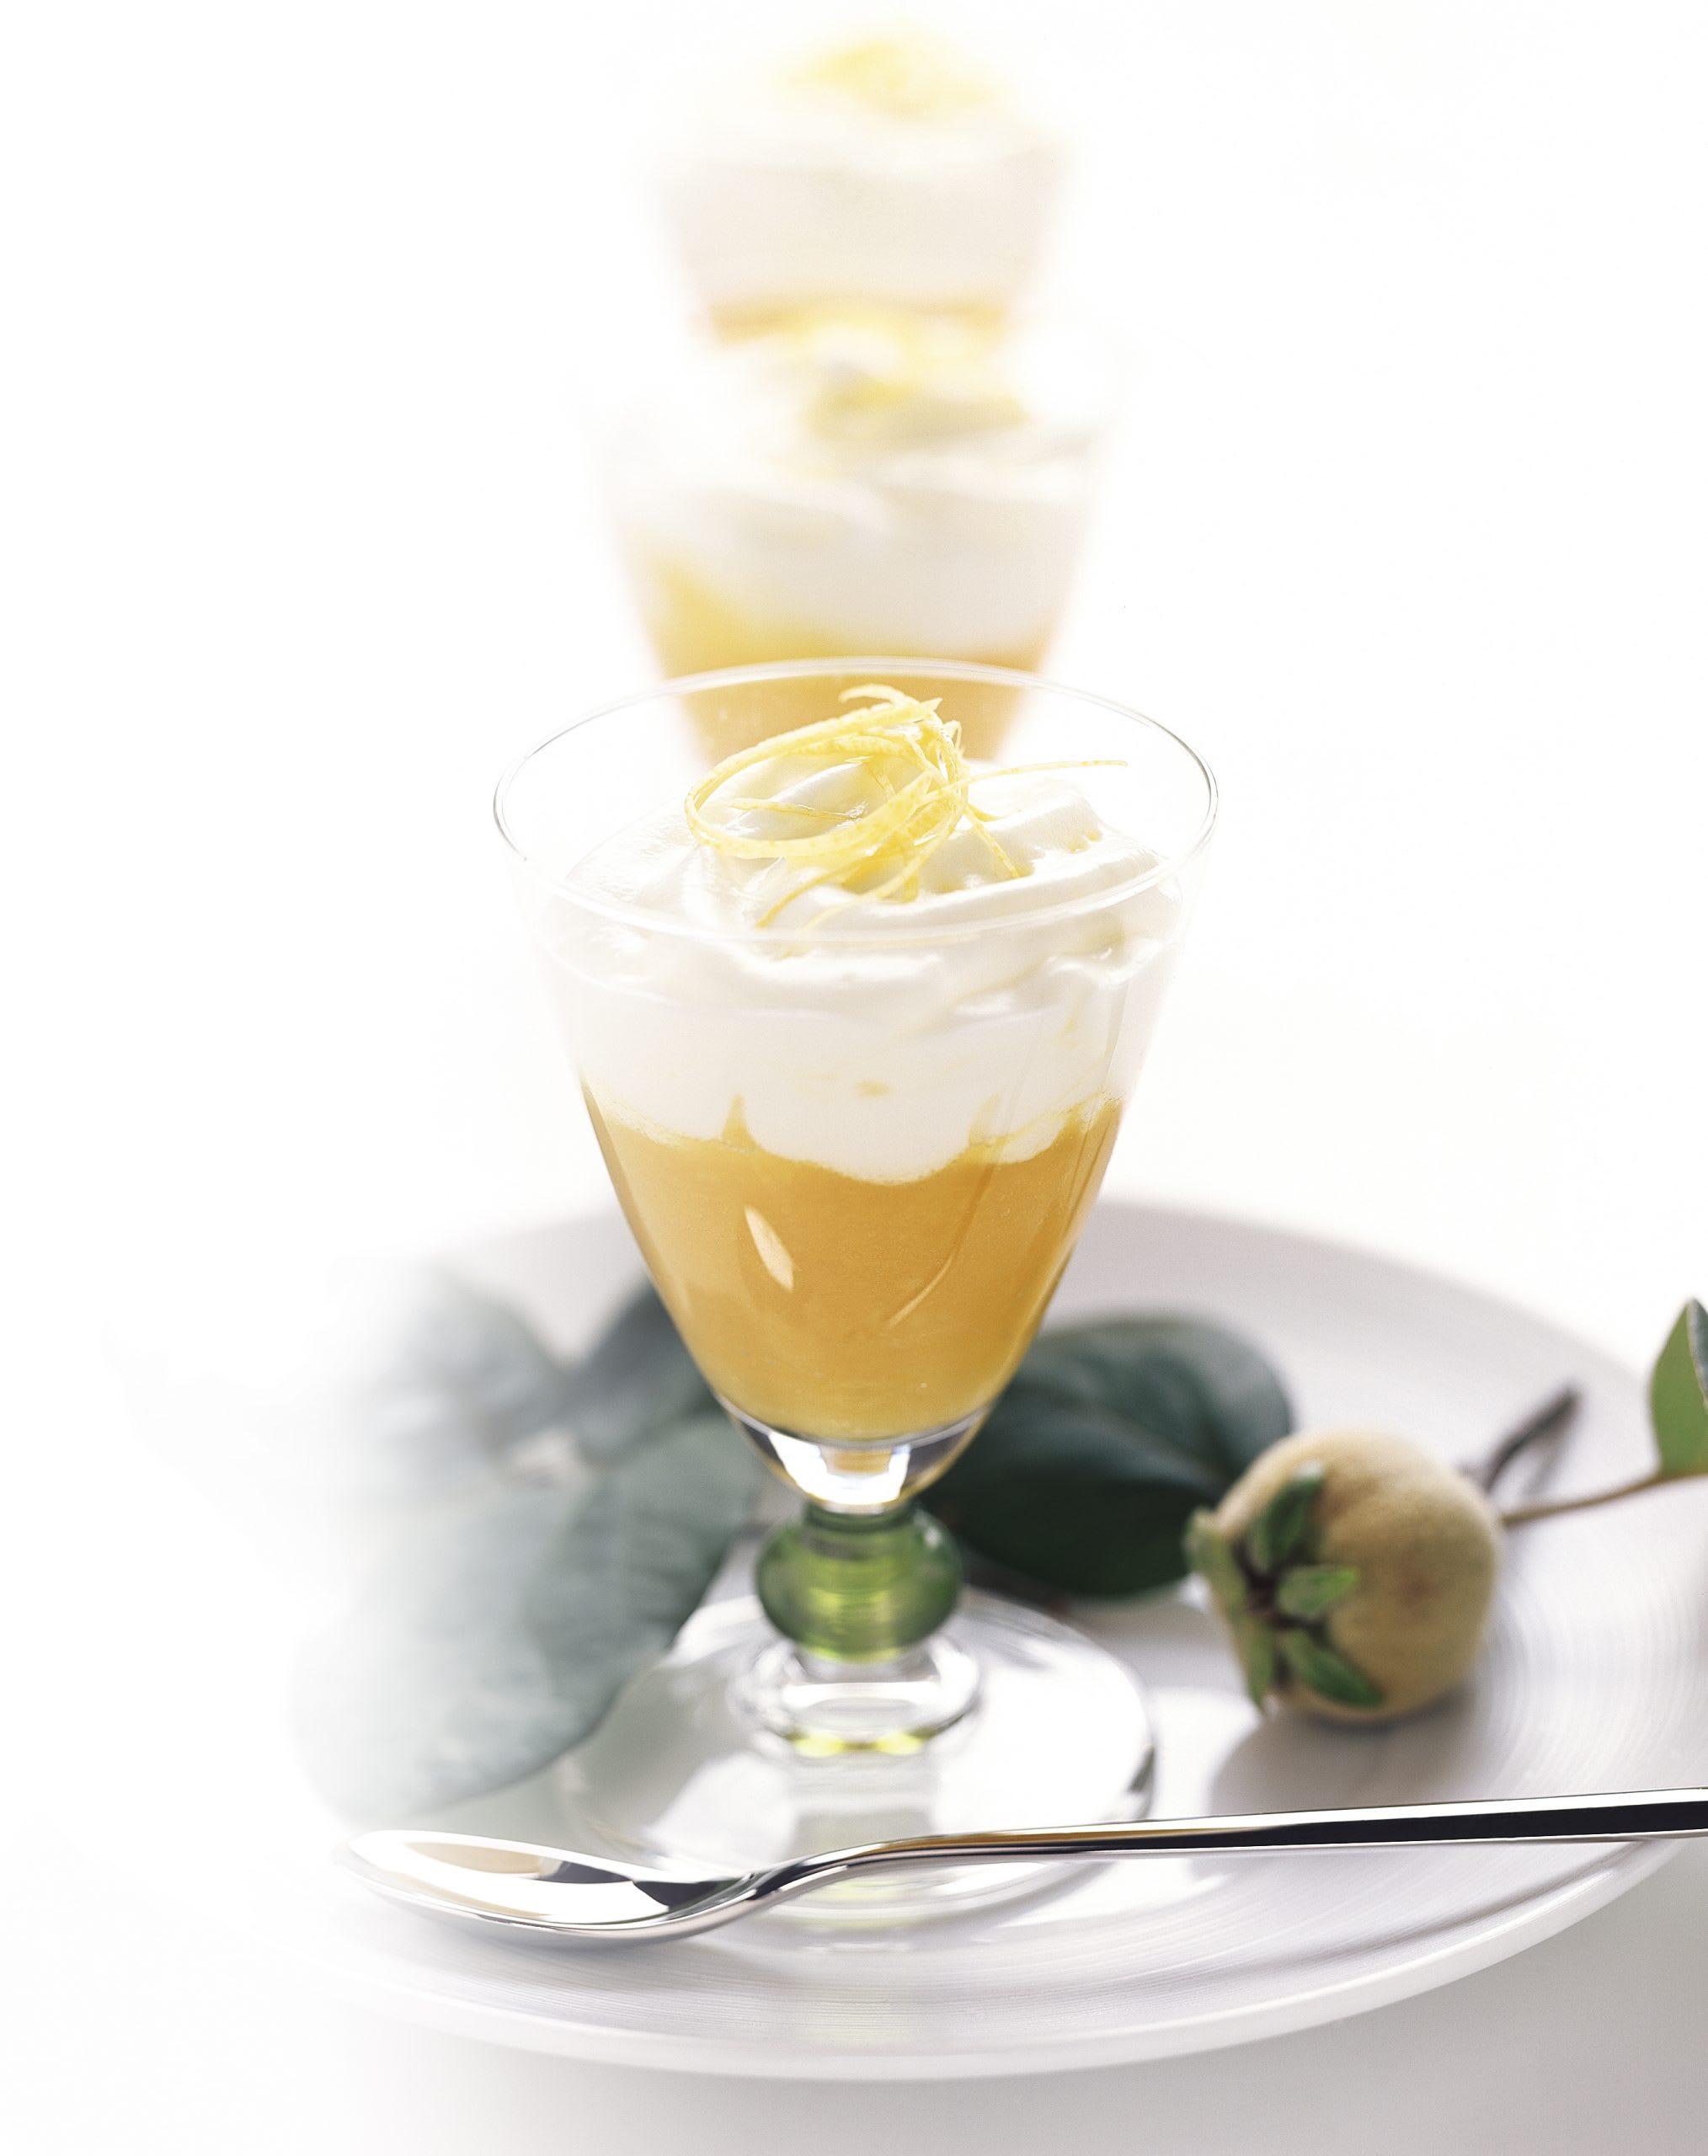 Espuma de citron et compote de coings